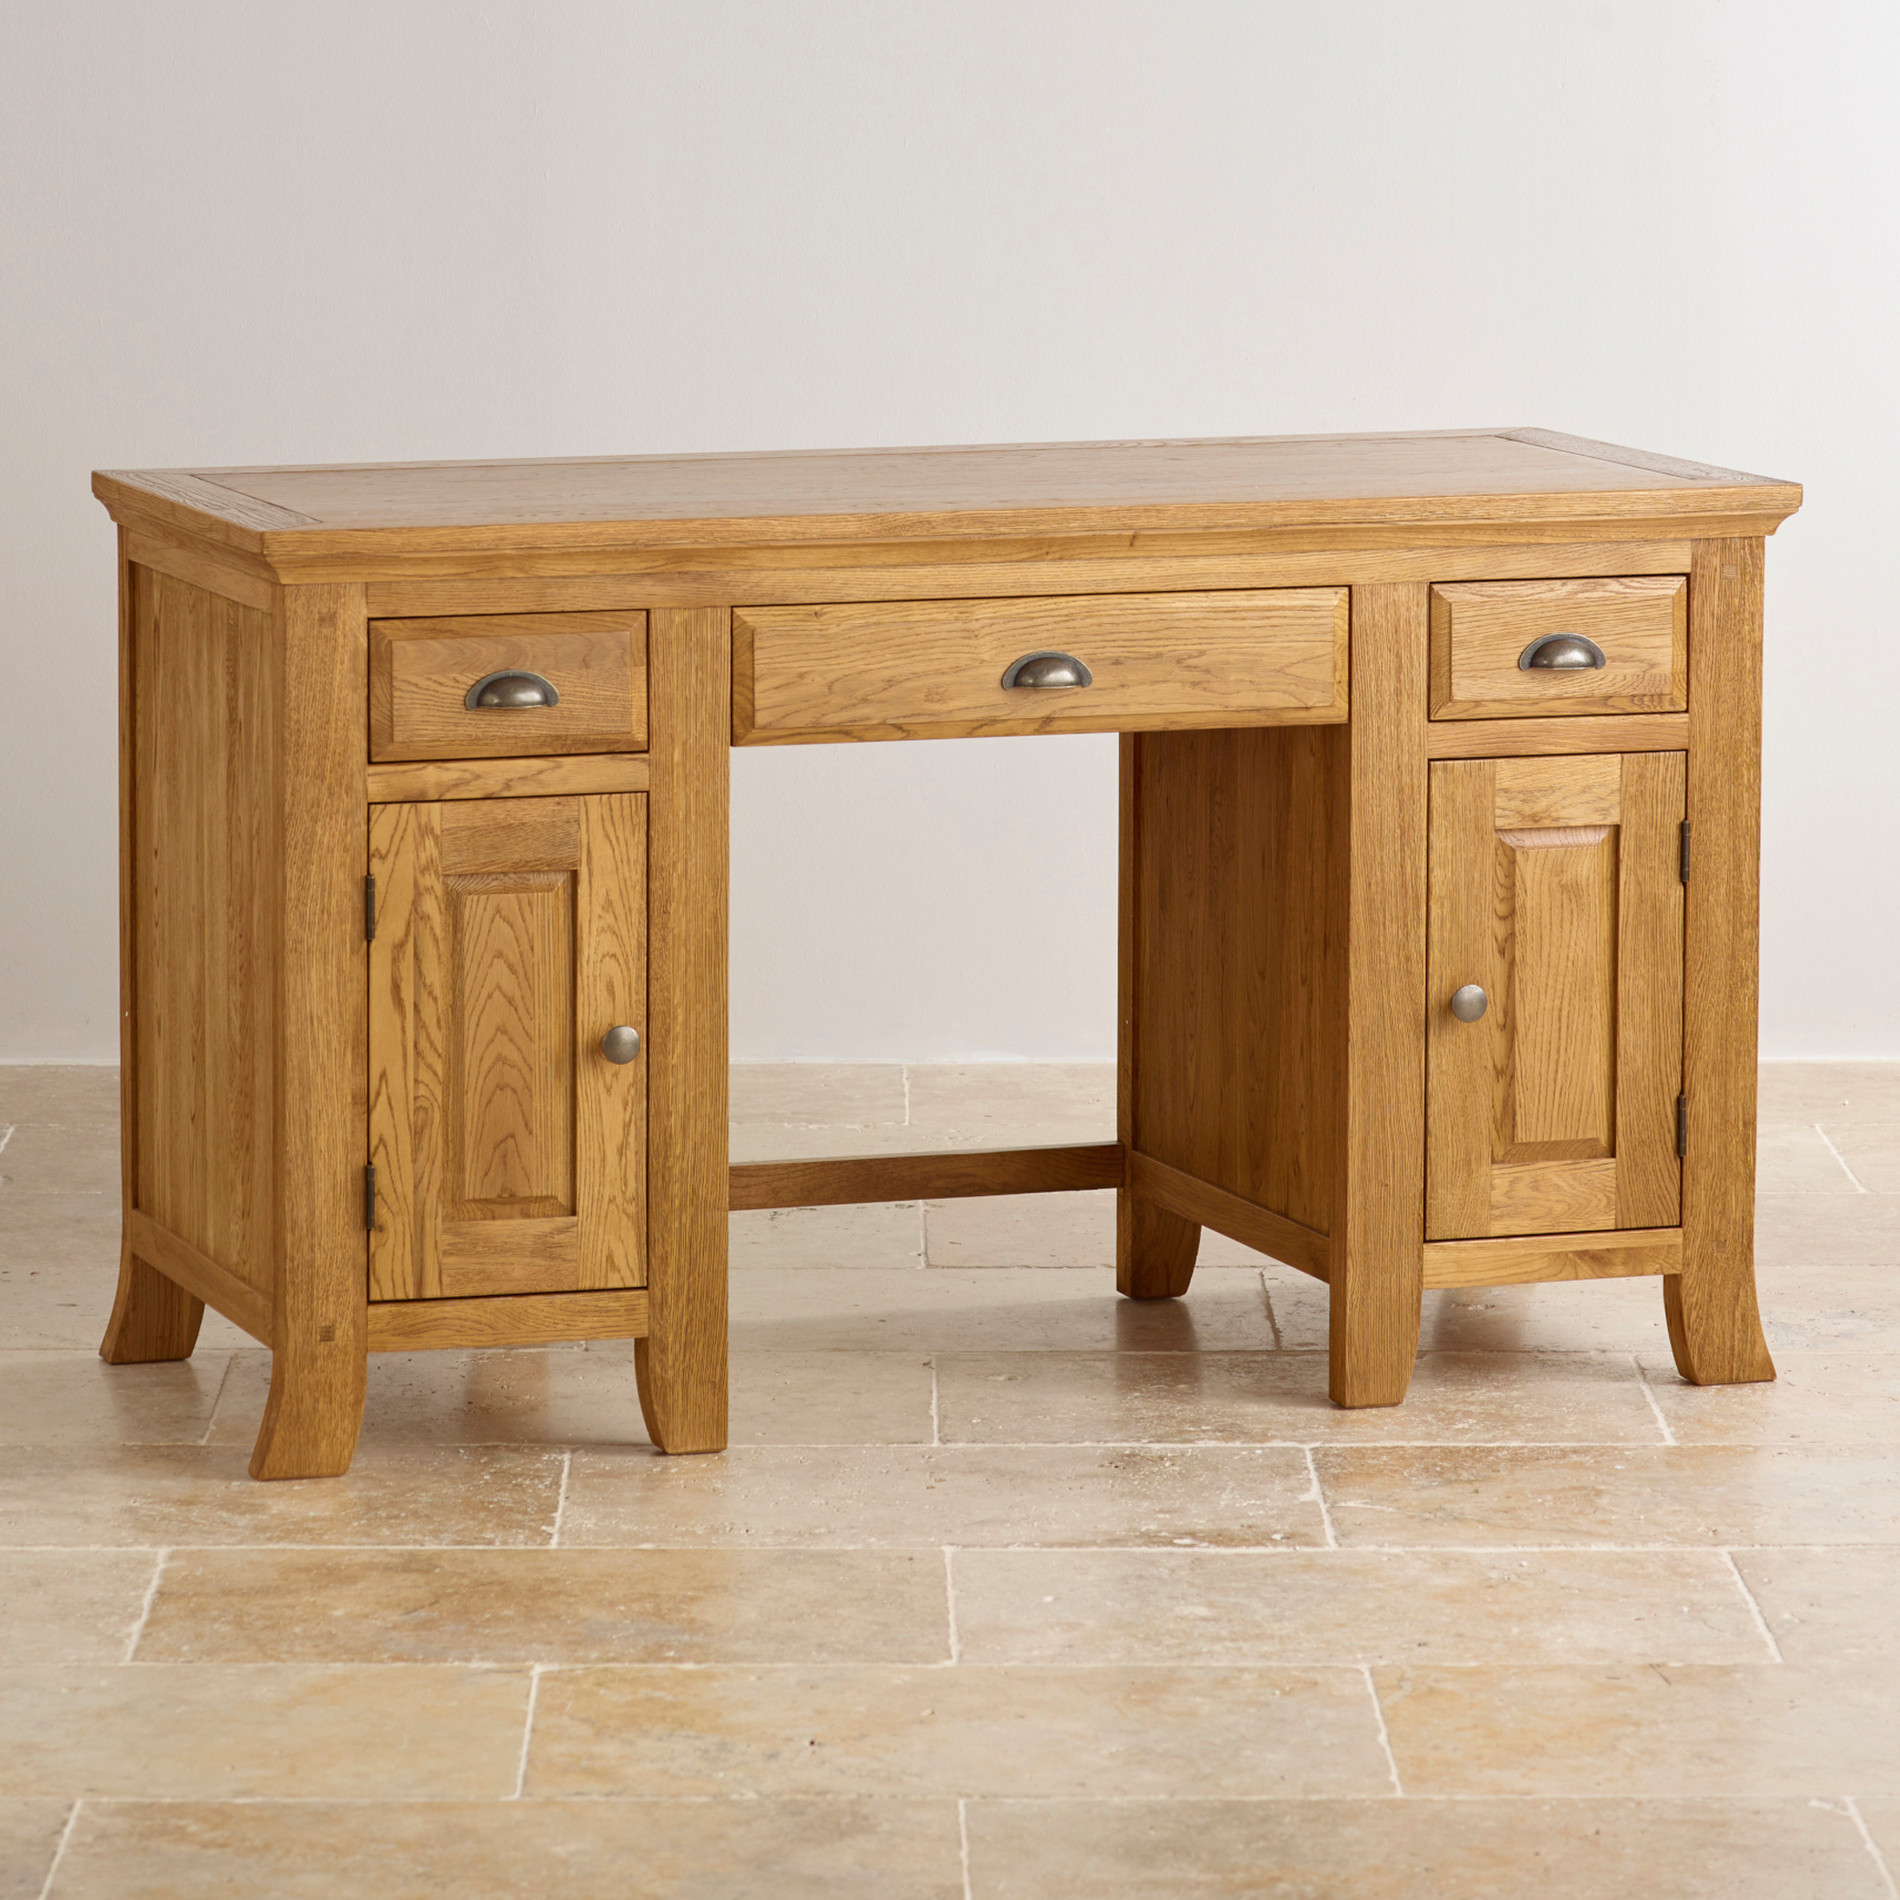 Taunton Computer Desk In Rustic Solid Oak Oak Furniture Land